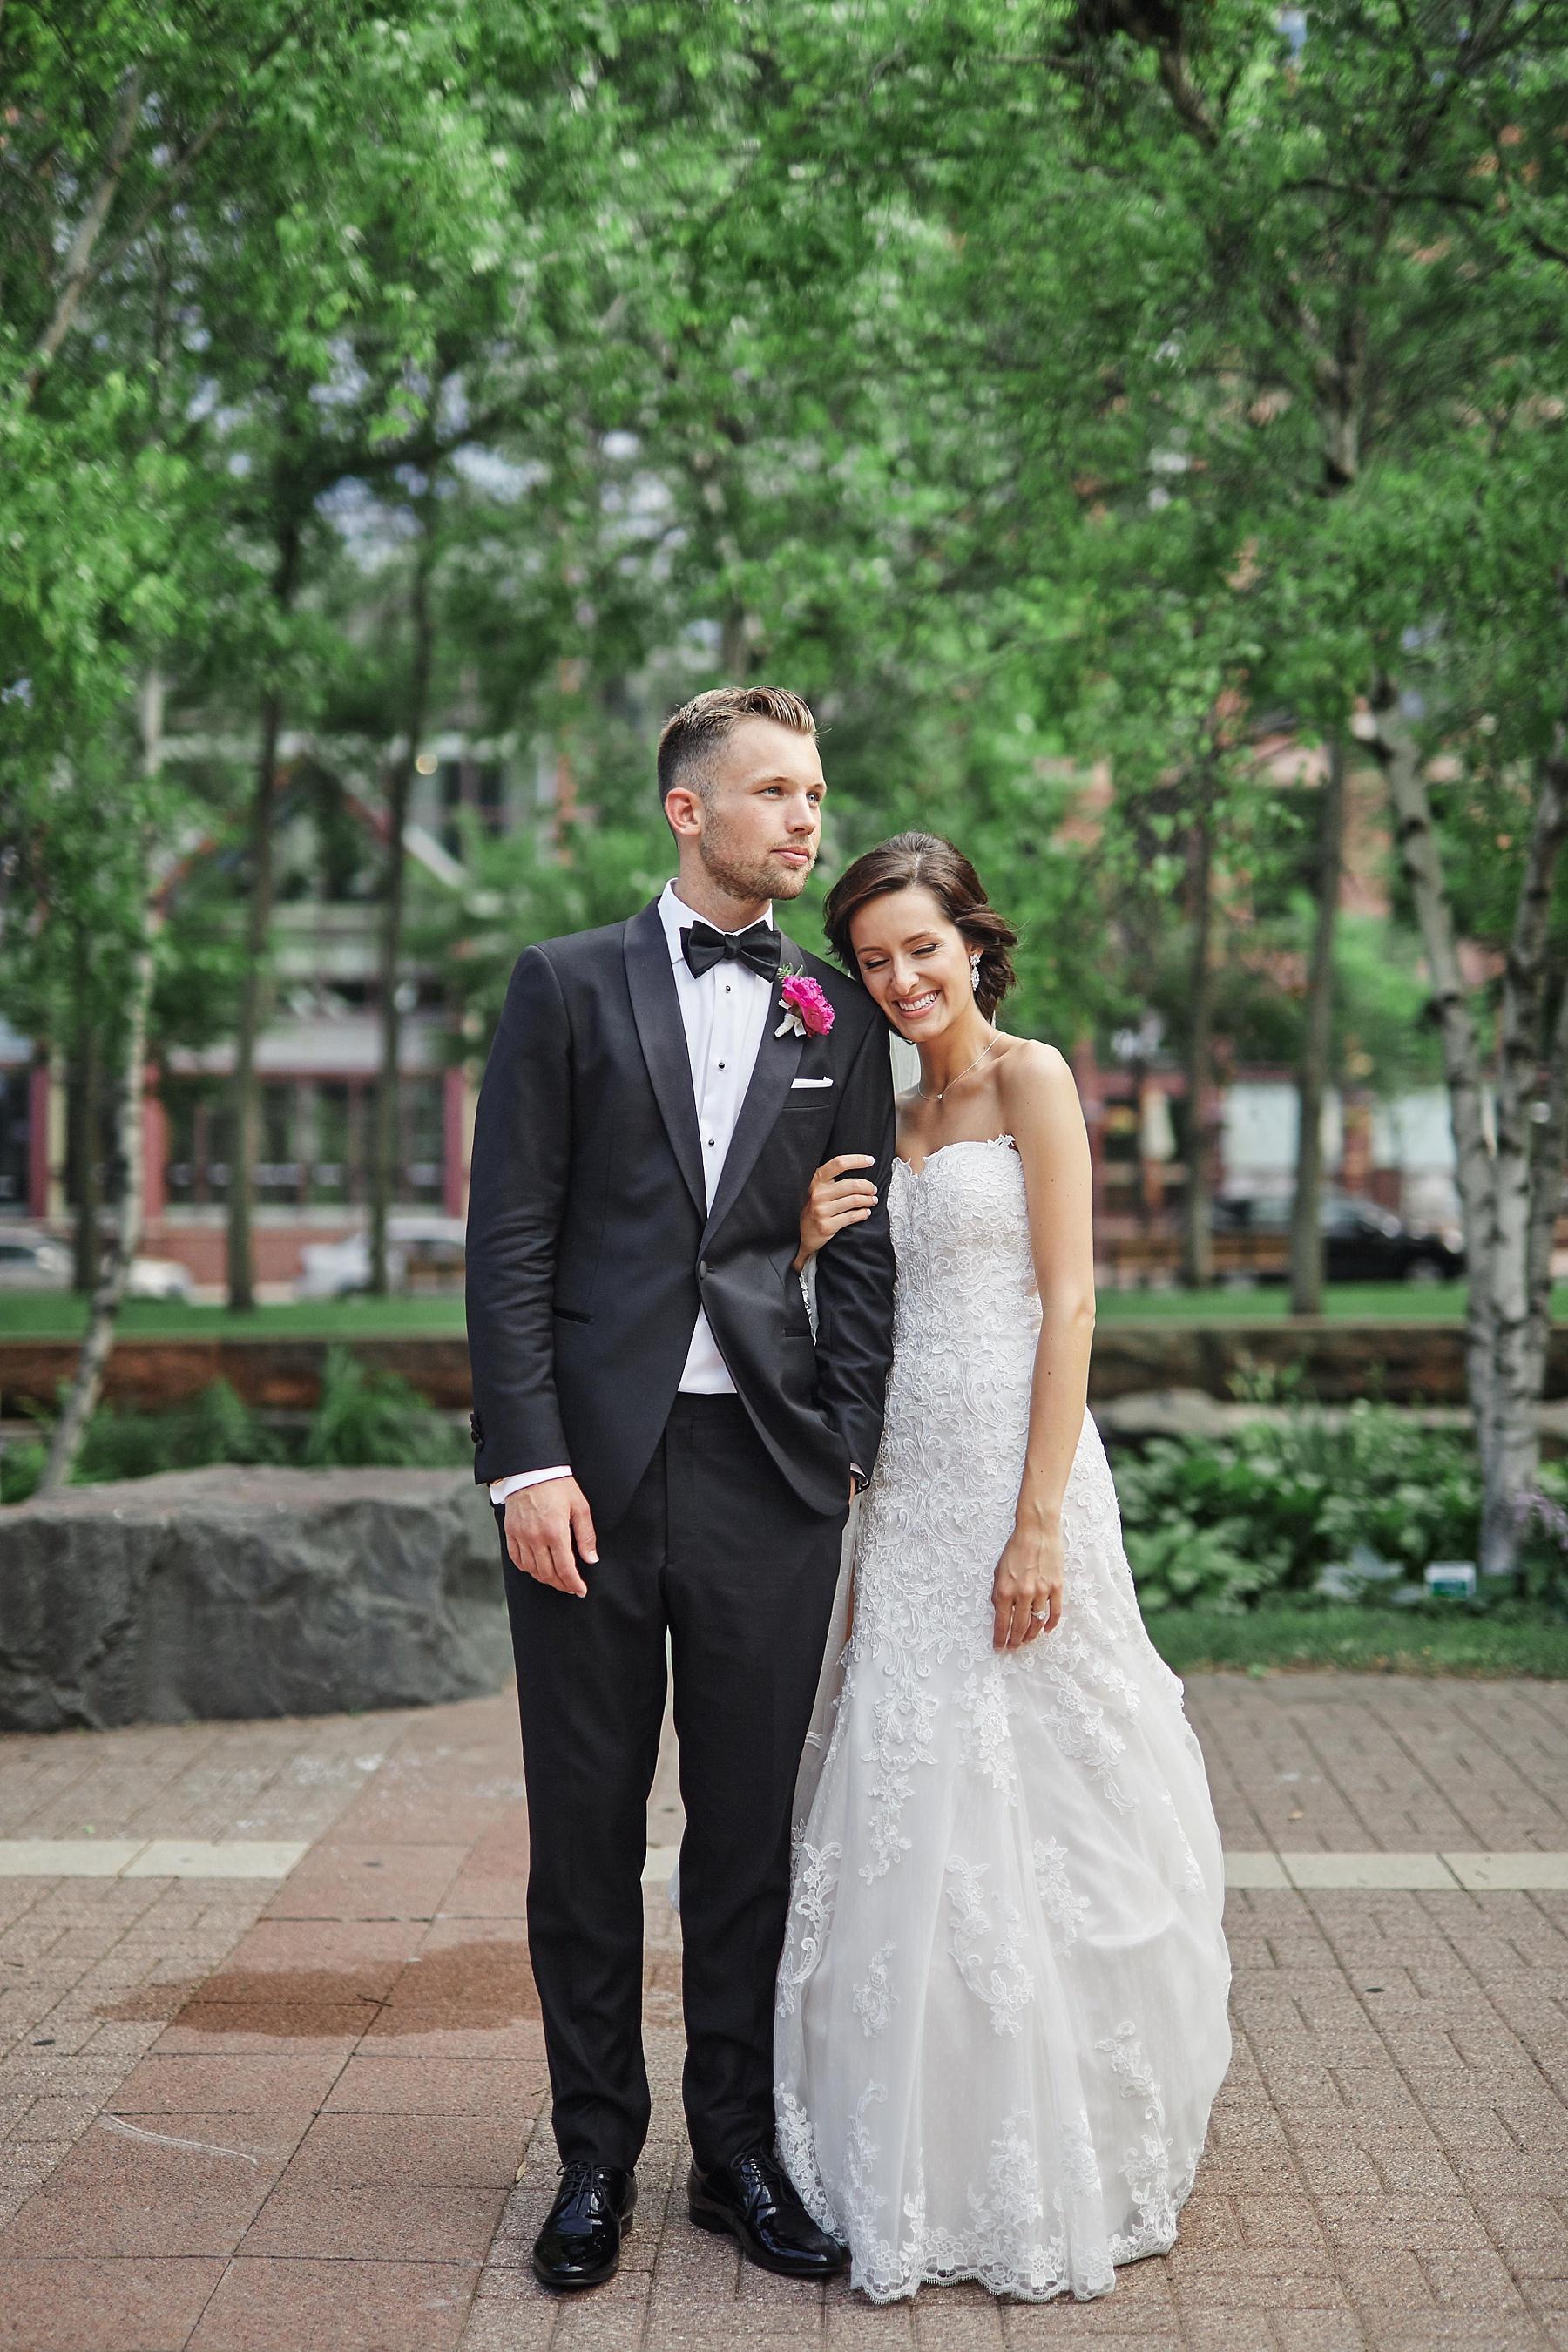 ABULAE-Wedding-Saint-paul-MN-Josh-Sofia-Wedding-Mears-Park_0782.jpg